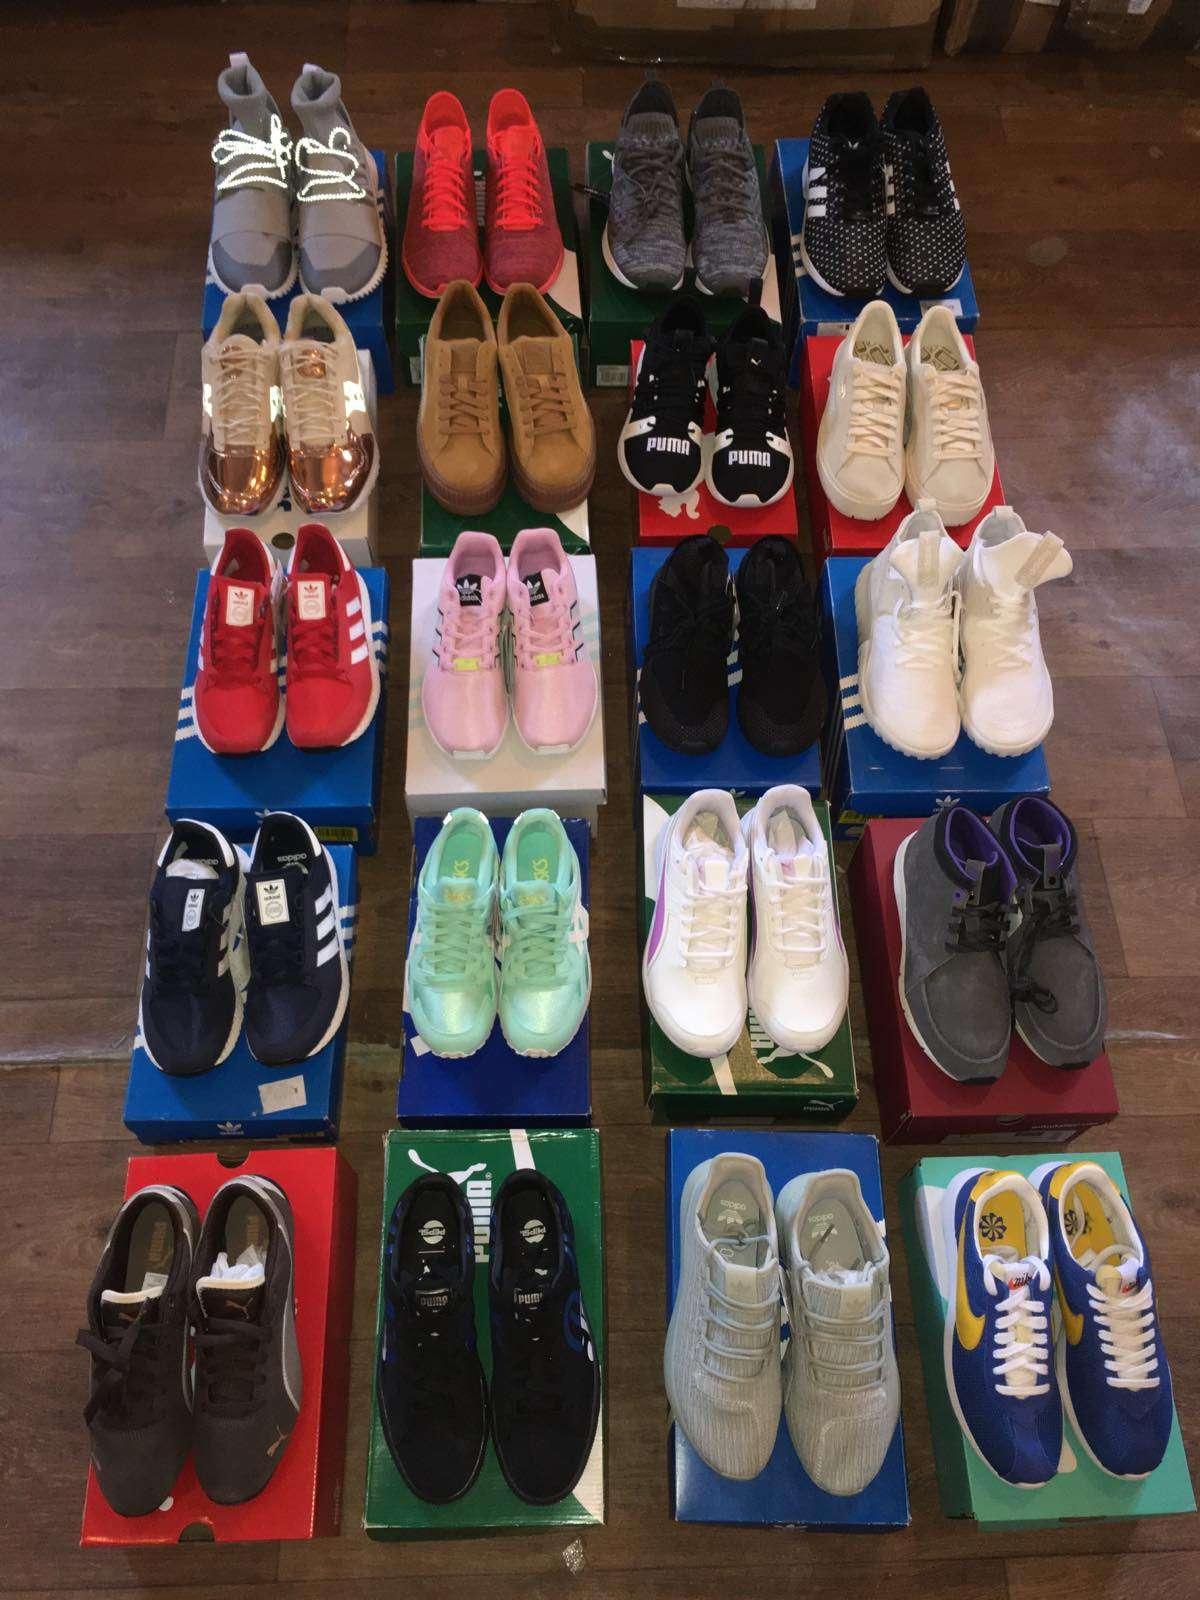 Сток спортивной обуви Nike, Puma, Vans, Adidas, Asics фото 4